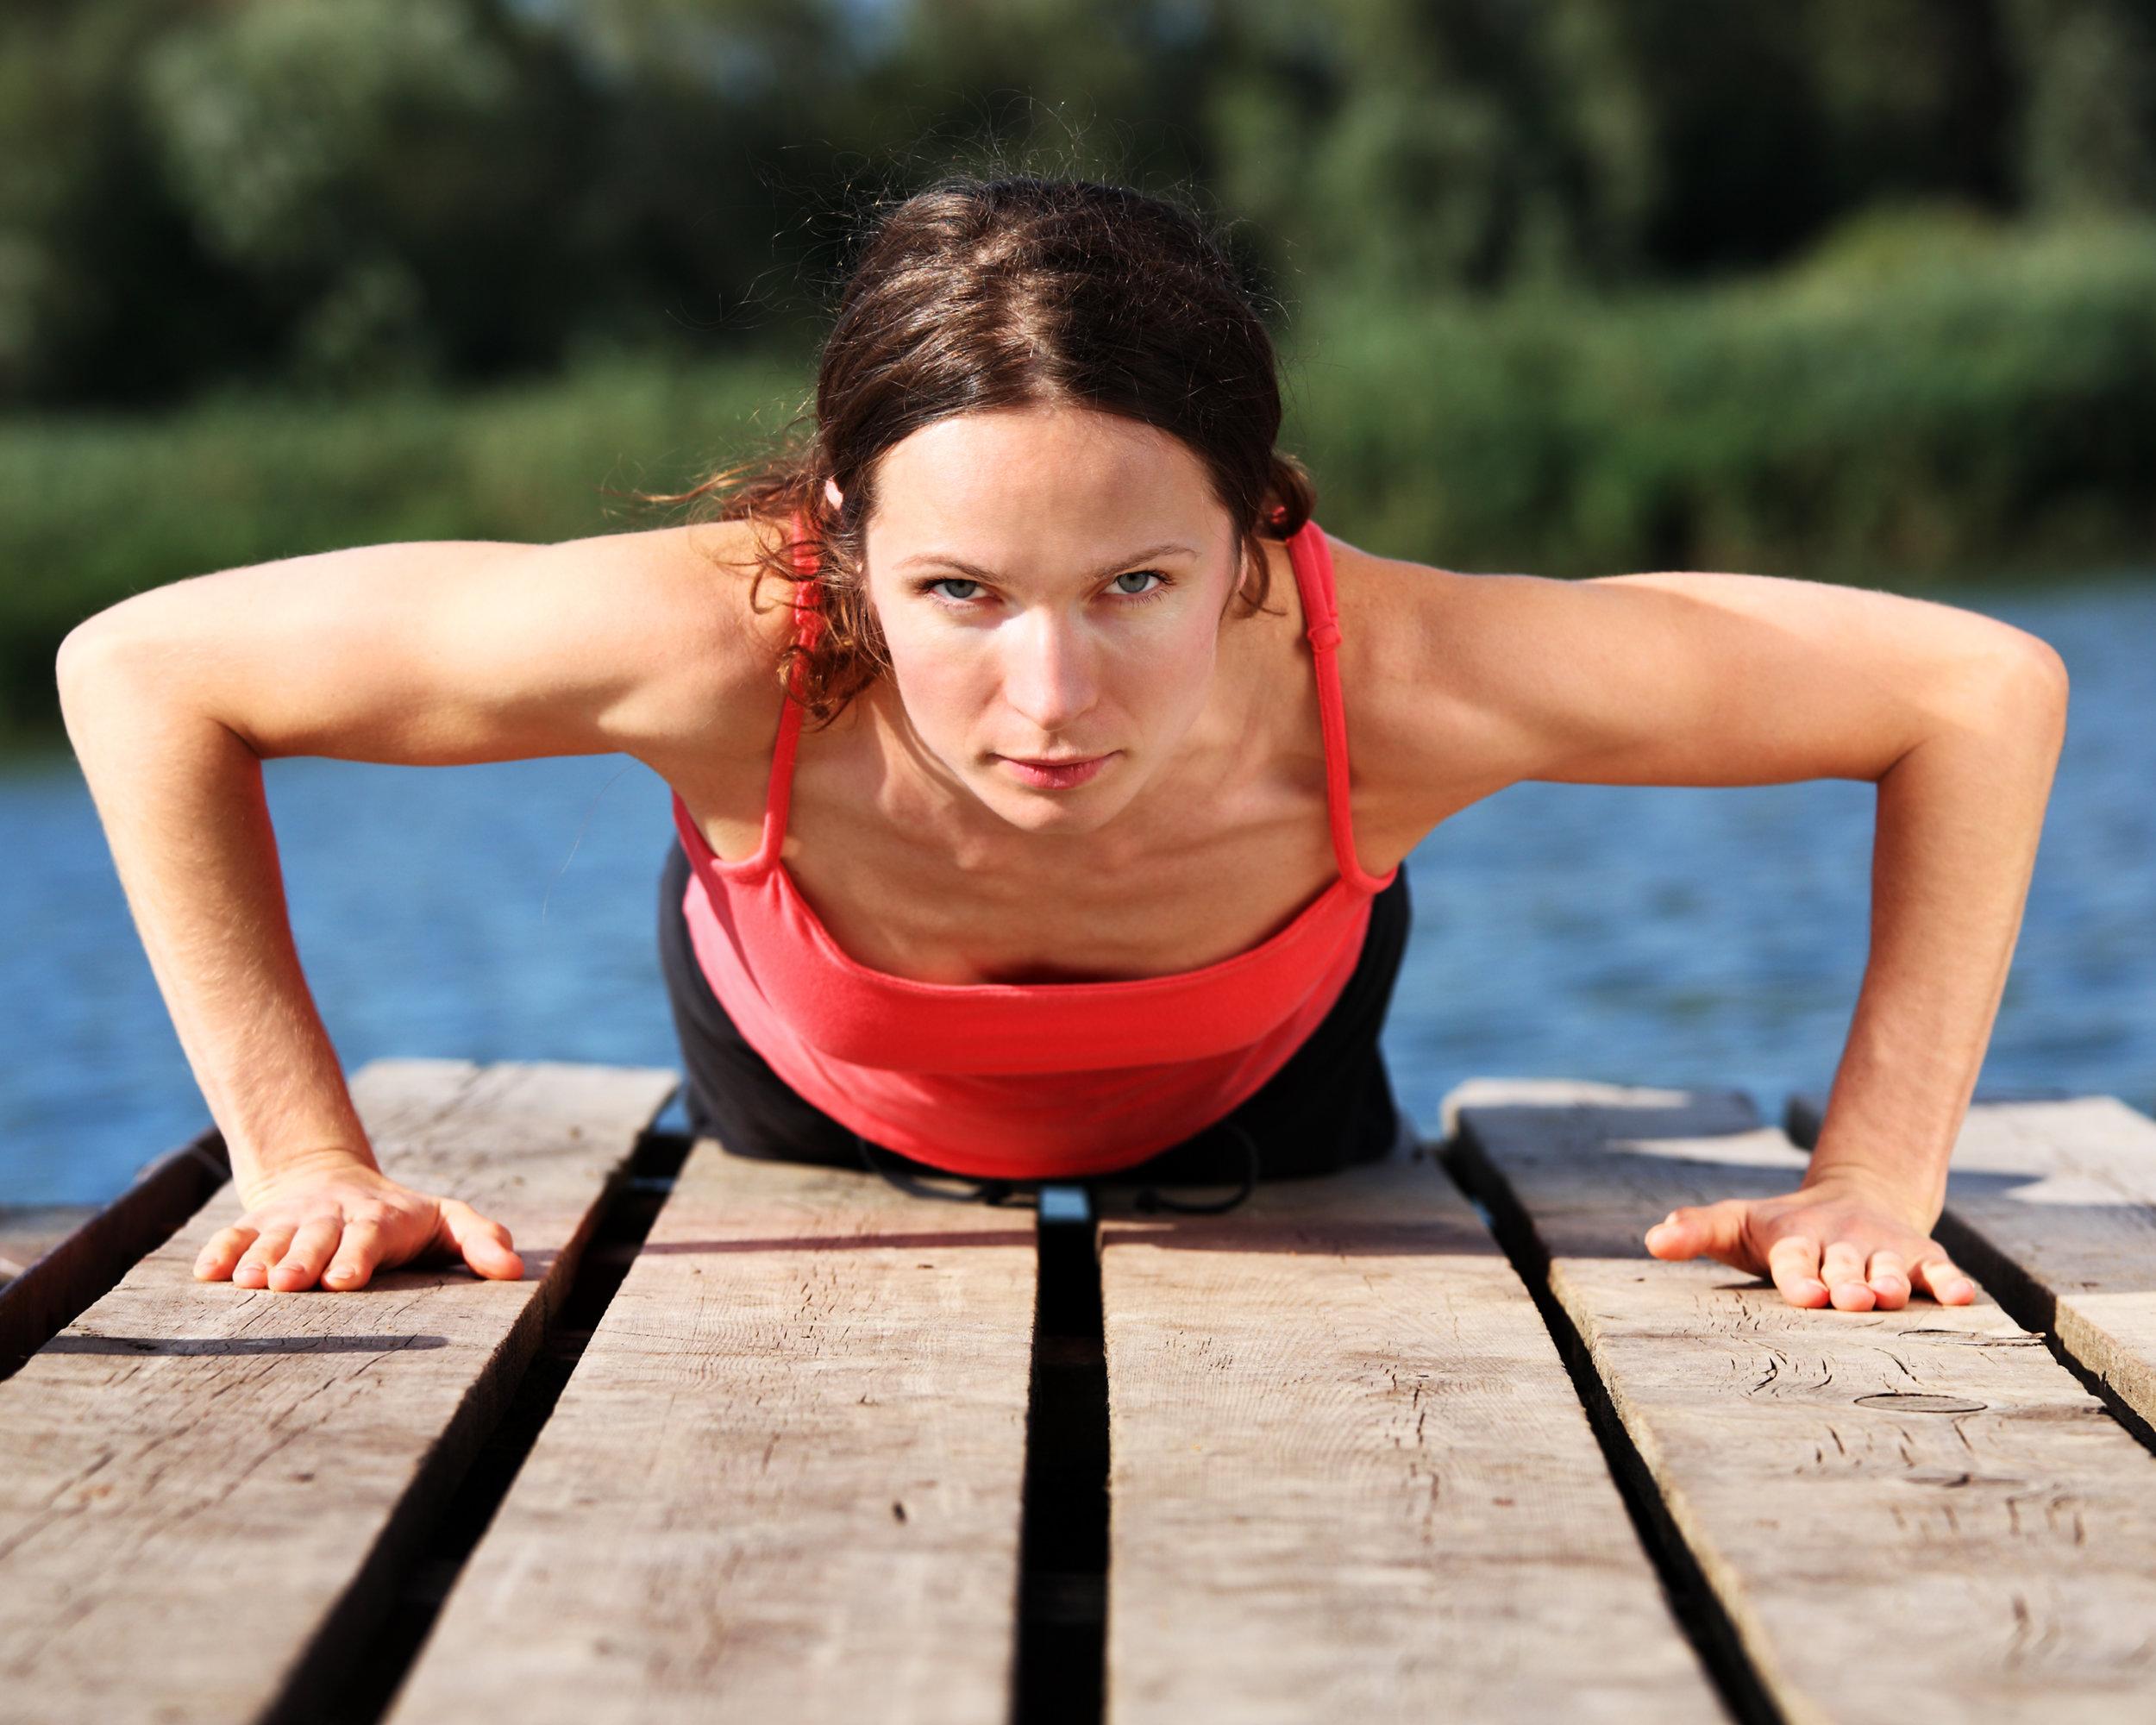 woman-doing-push-ups-P8PE7ZP.jpg